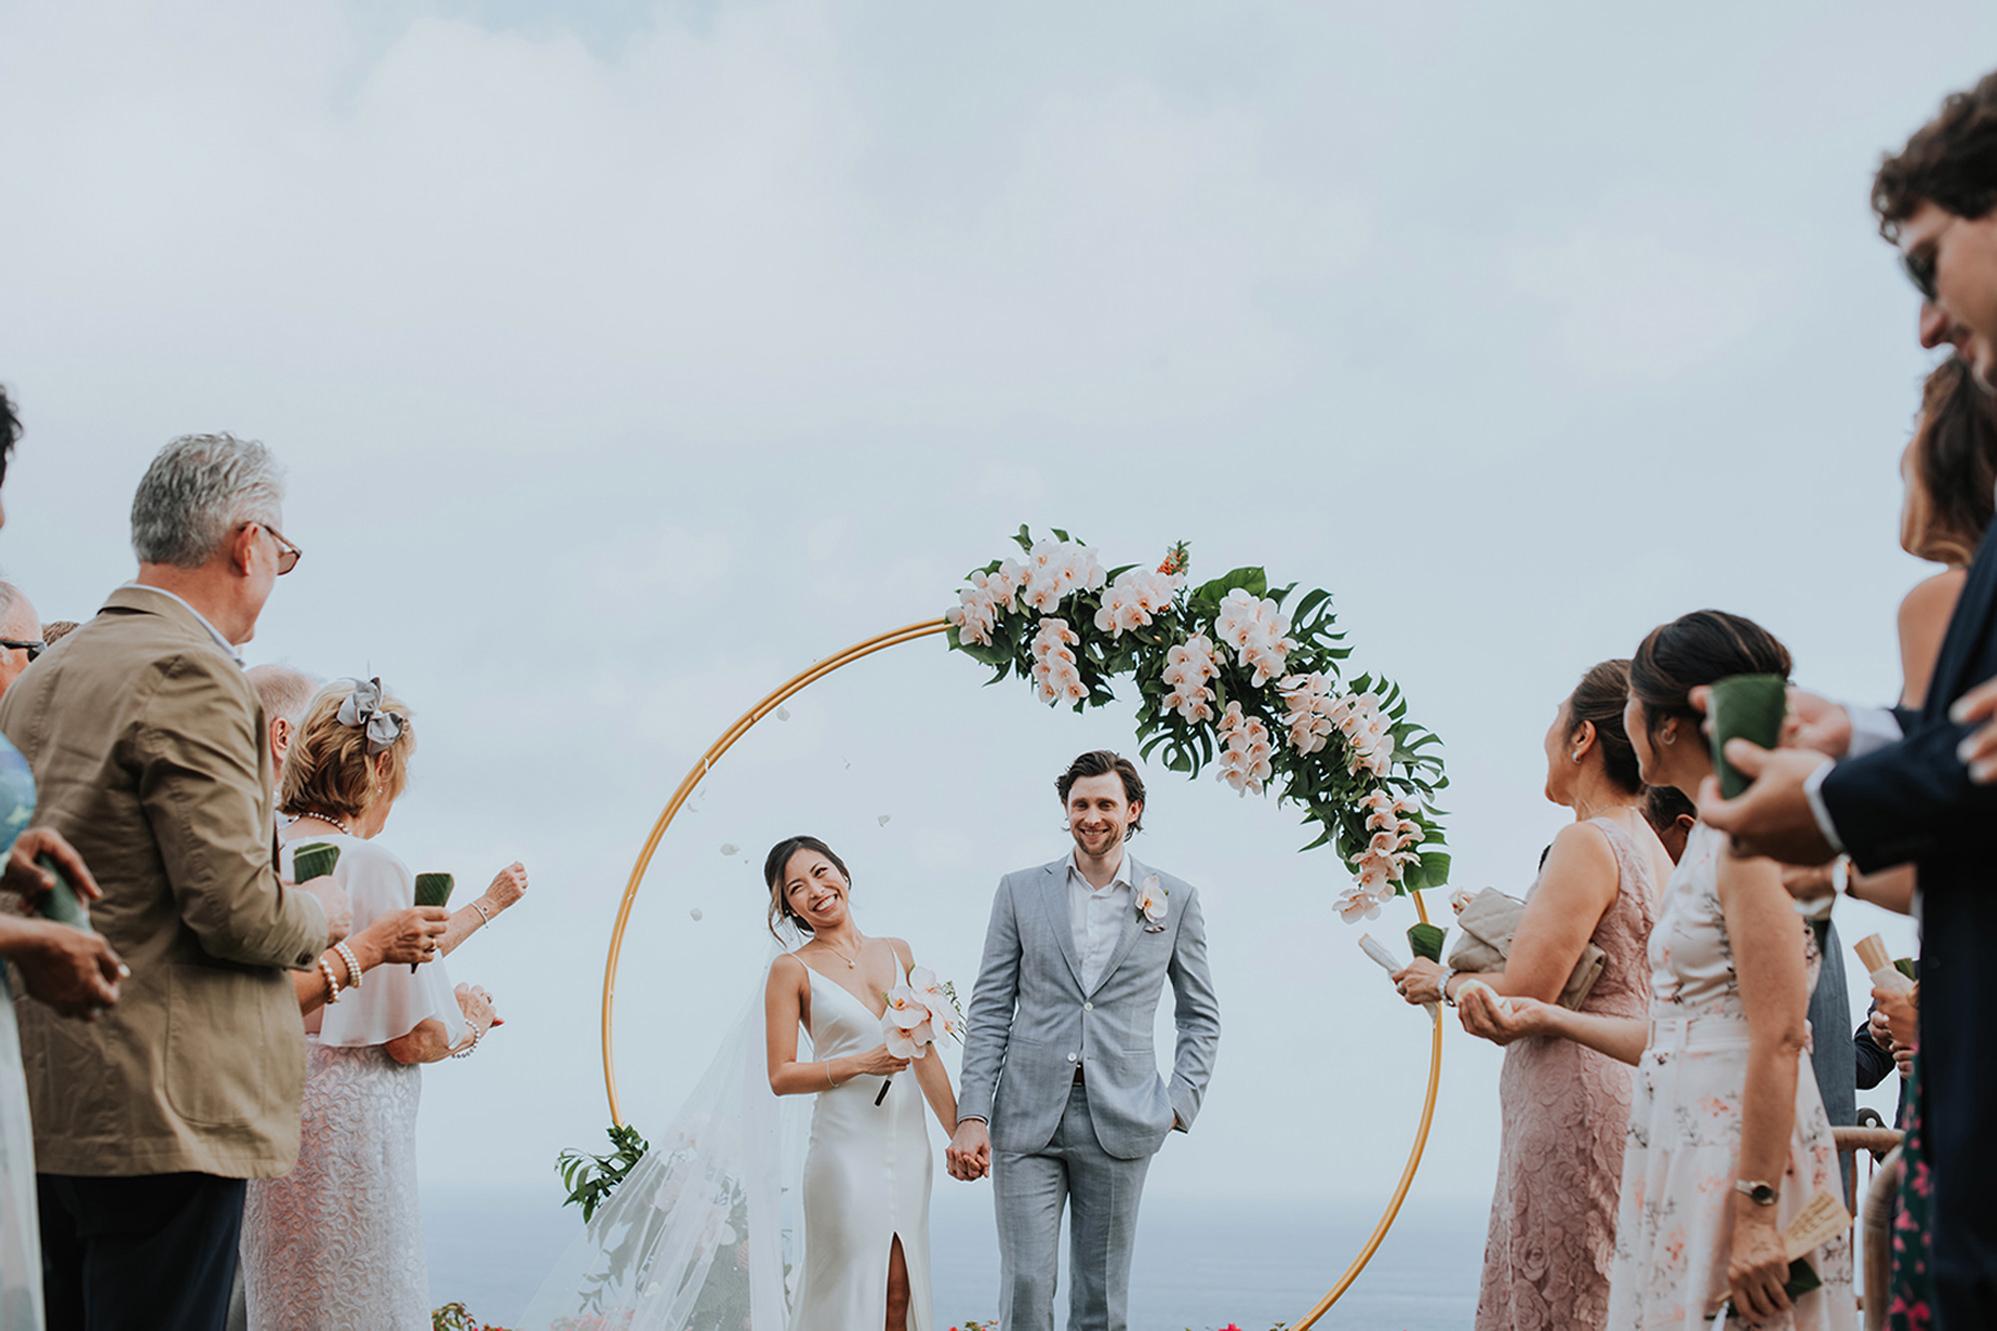 smiling-couple-under-circular-floral-arbor-mun-keat-studio